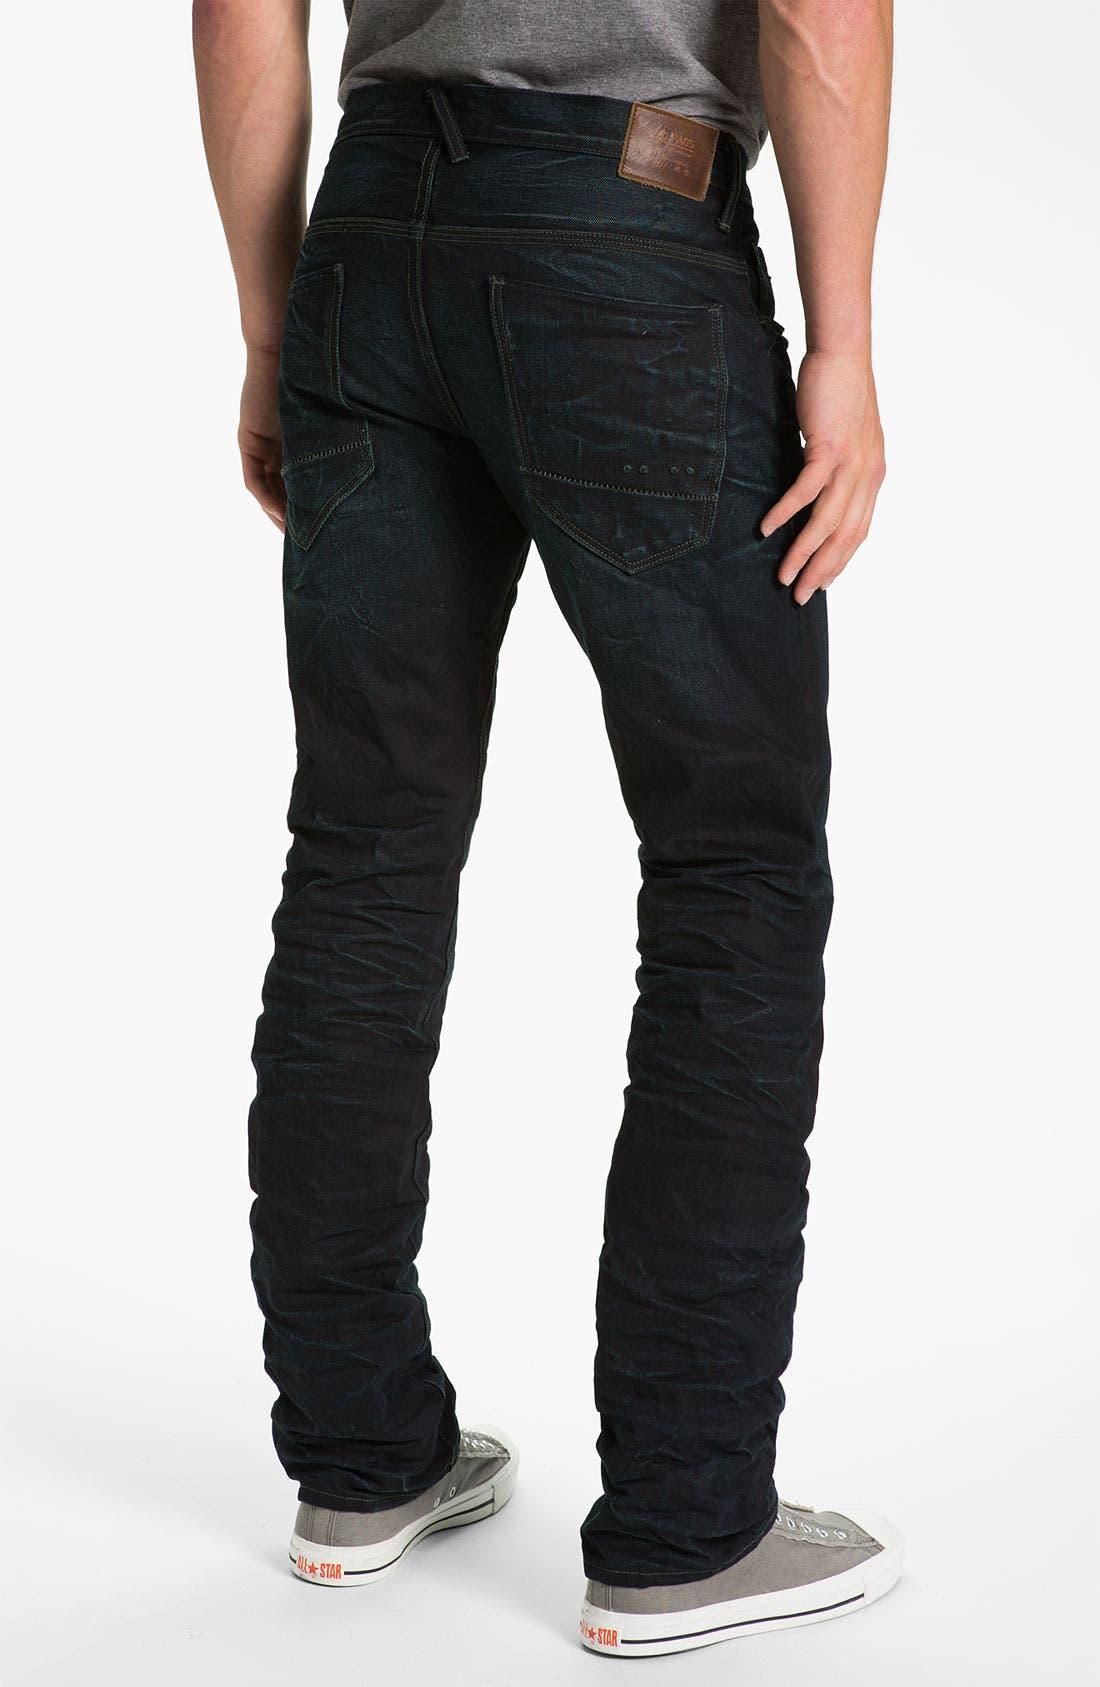 Alternate Image 1 Selected - J.C. Rags 'Alpha' Straight Leg Jeans (Used)